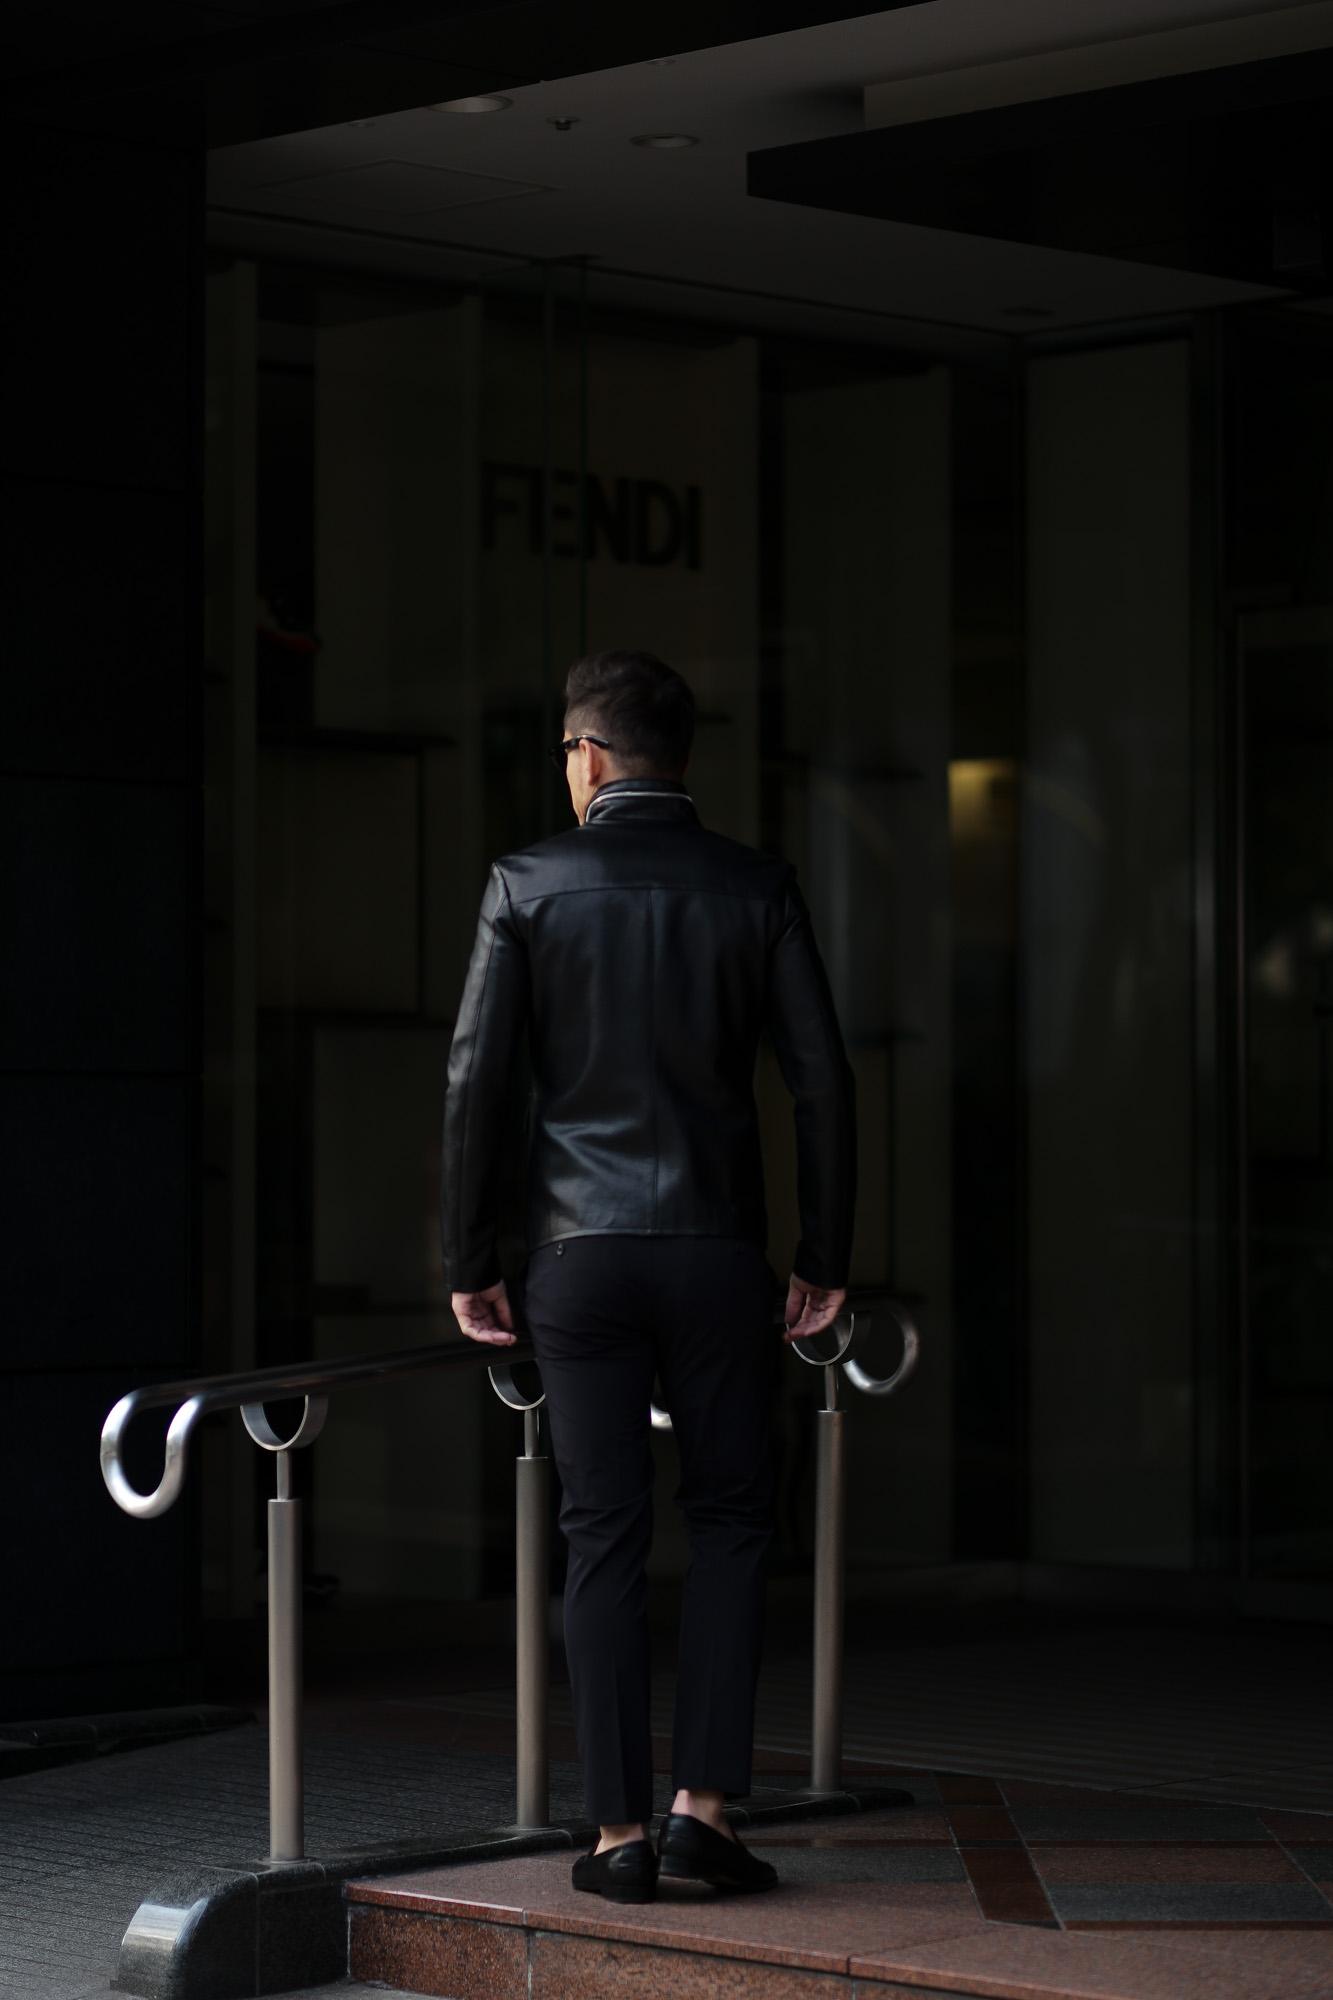 cuervo bopoha (クエルボ ヴァローナ) Satisfaction Leather Collection (サティスファクション レザー コレクション) HUNK(ハンク) BUFFALO LEATHER (バッファロー レザー) レザージャケット BLACK(ブラック) MADE IN JAPAN (日本製) 2020 春夏 愛知 名古屋 altoediritto アルトエデリット バイオハザード ハンク バイオ BIOHAZARD